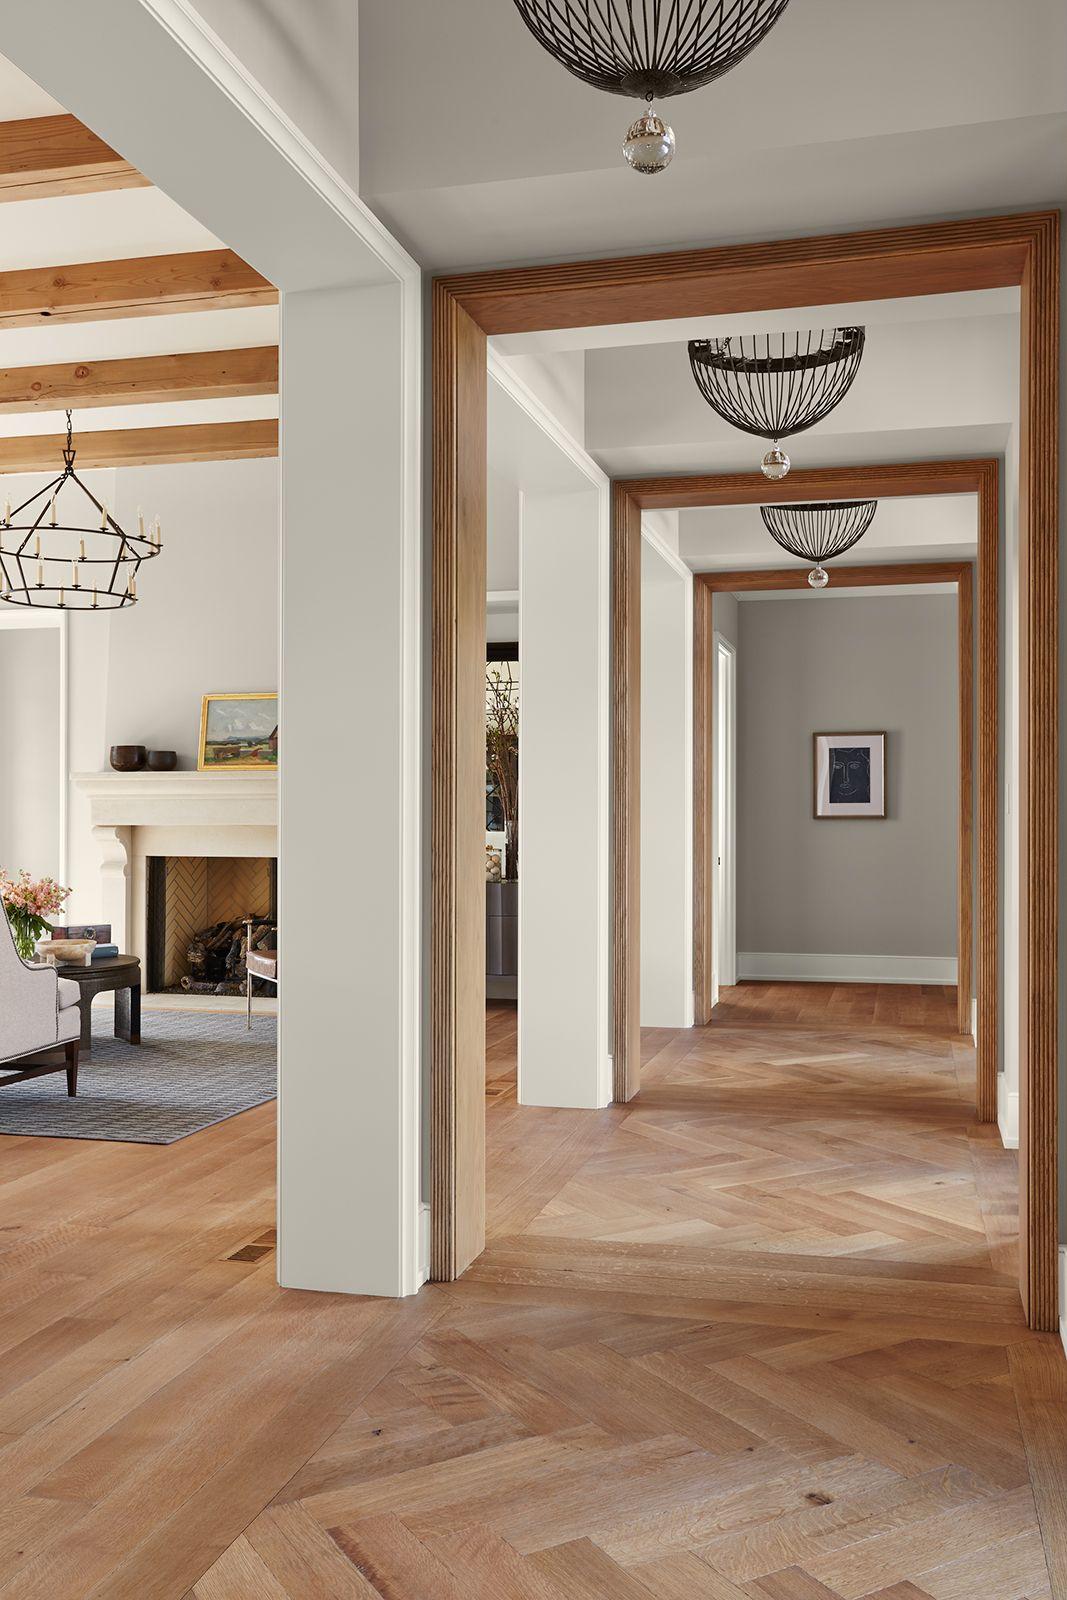 English Tudor Interior Design Ideas: Modern English Tudor By Vivid Interior Design And Hendel